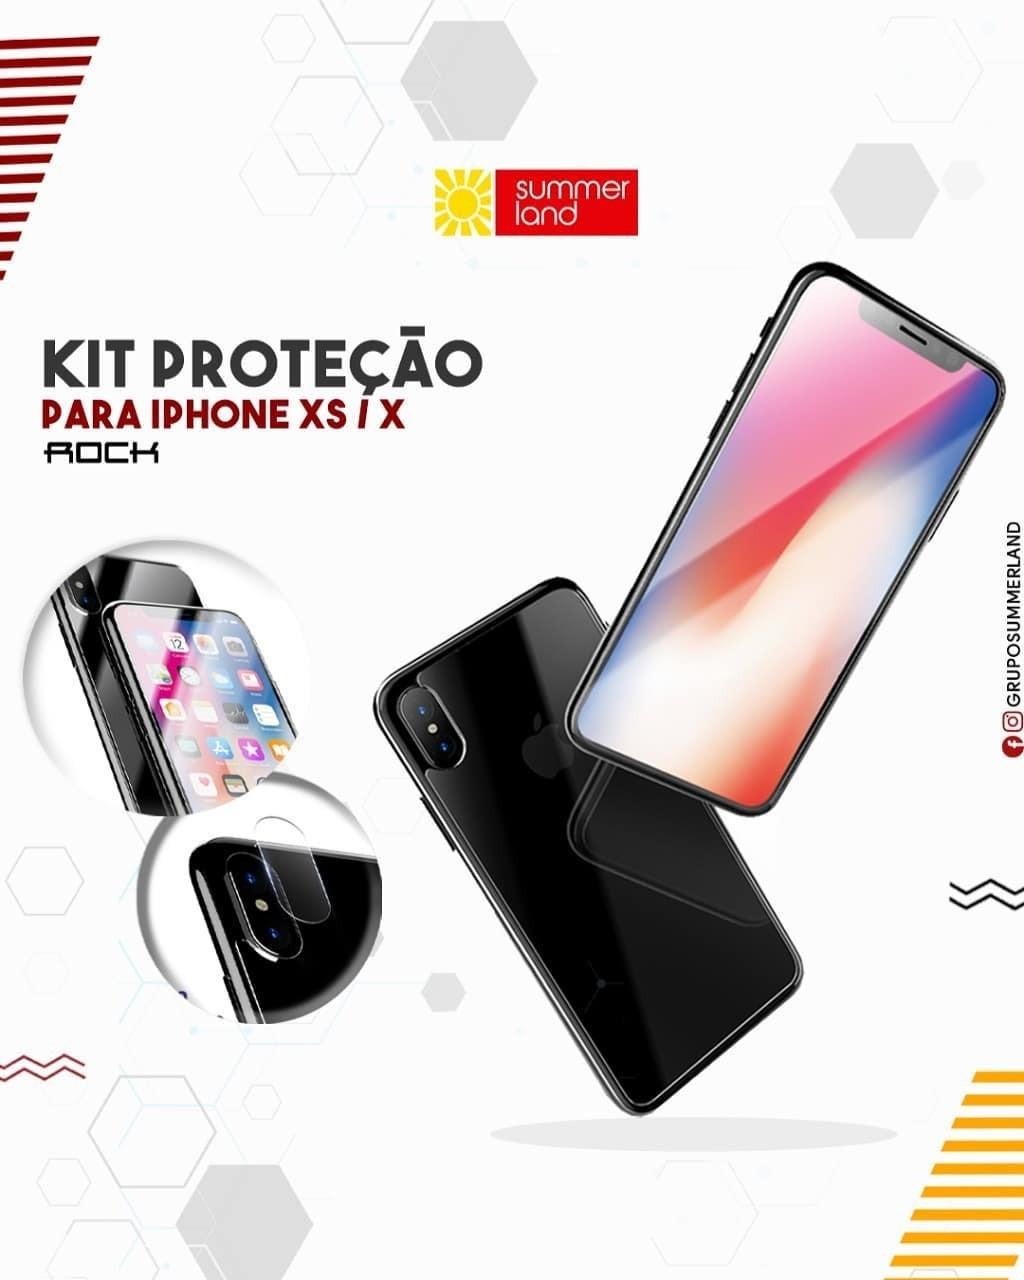 Kit Proteção para iPhone XS / X